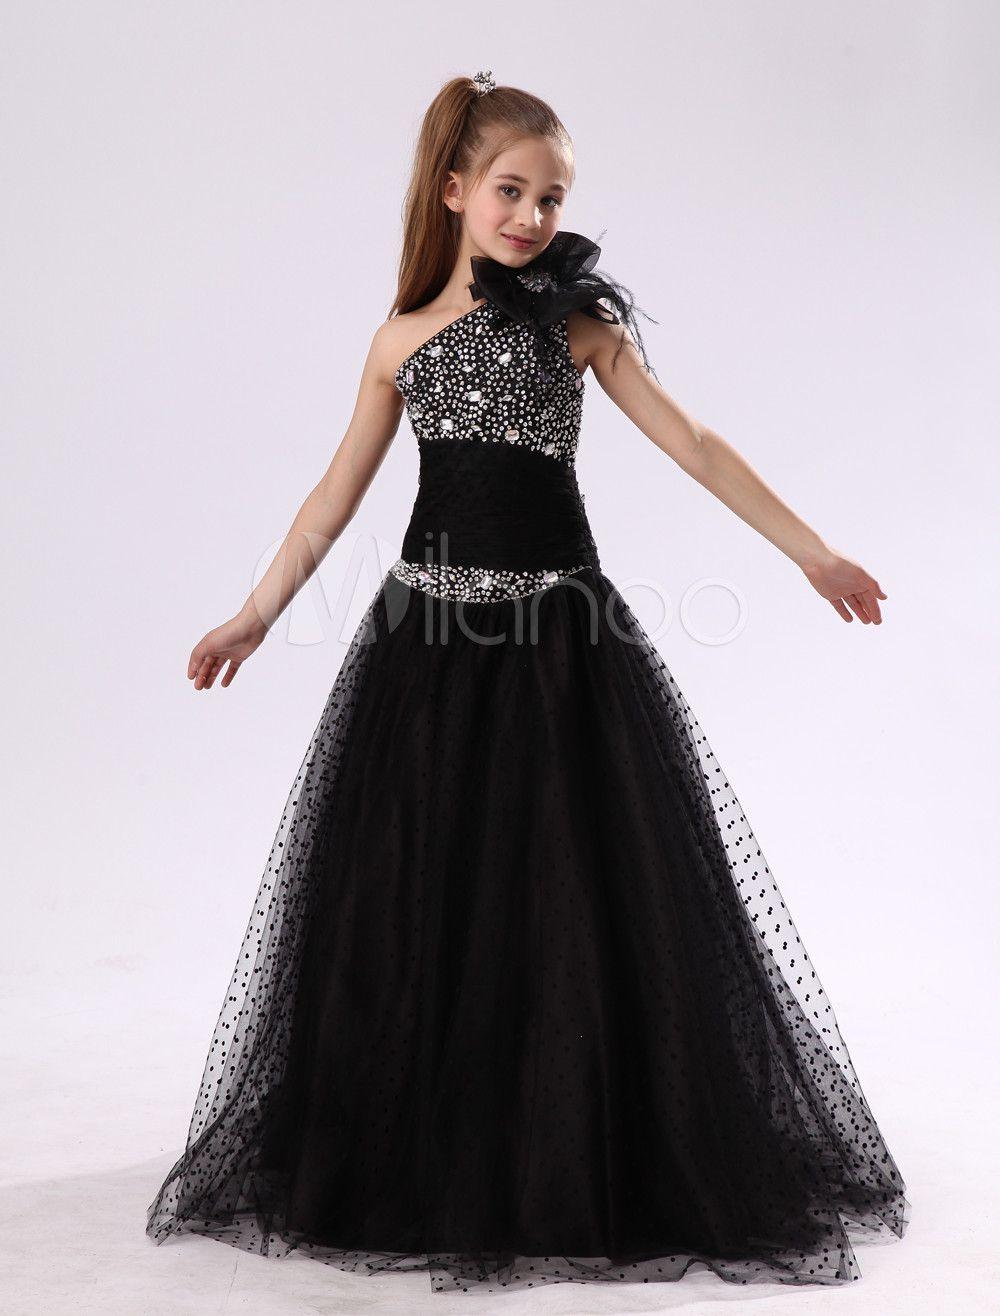 7f77b2b067c Flower Girl Dresses Black One Shoulder Junior Bridesmaid Rhinestone ...